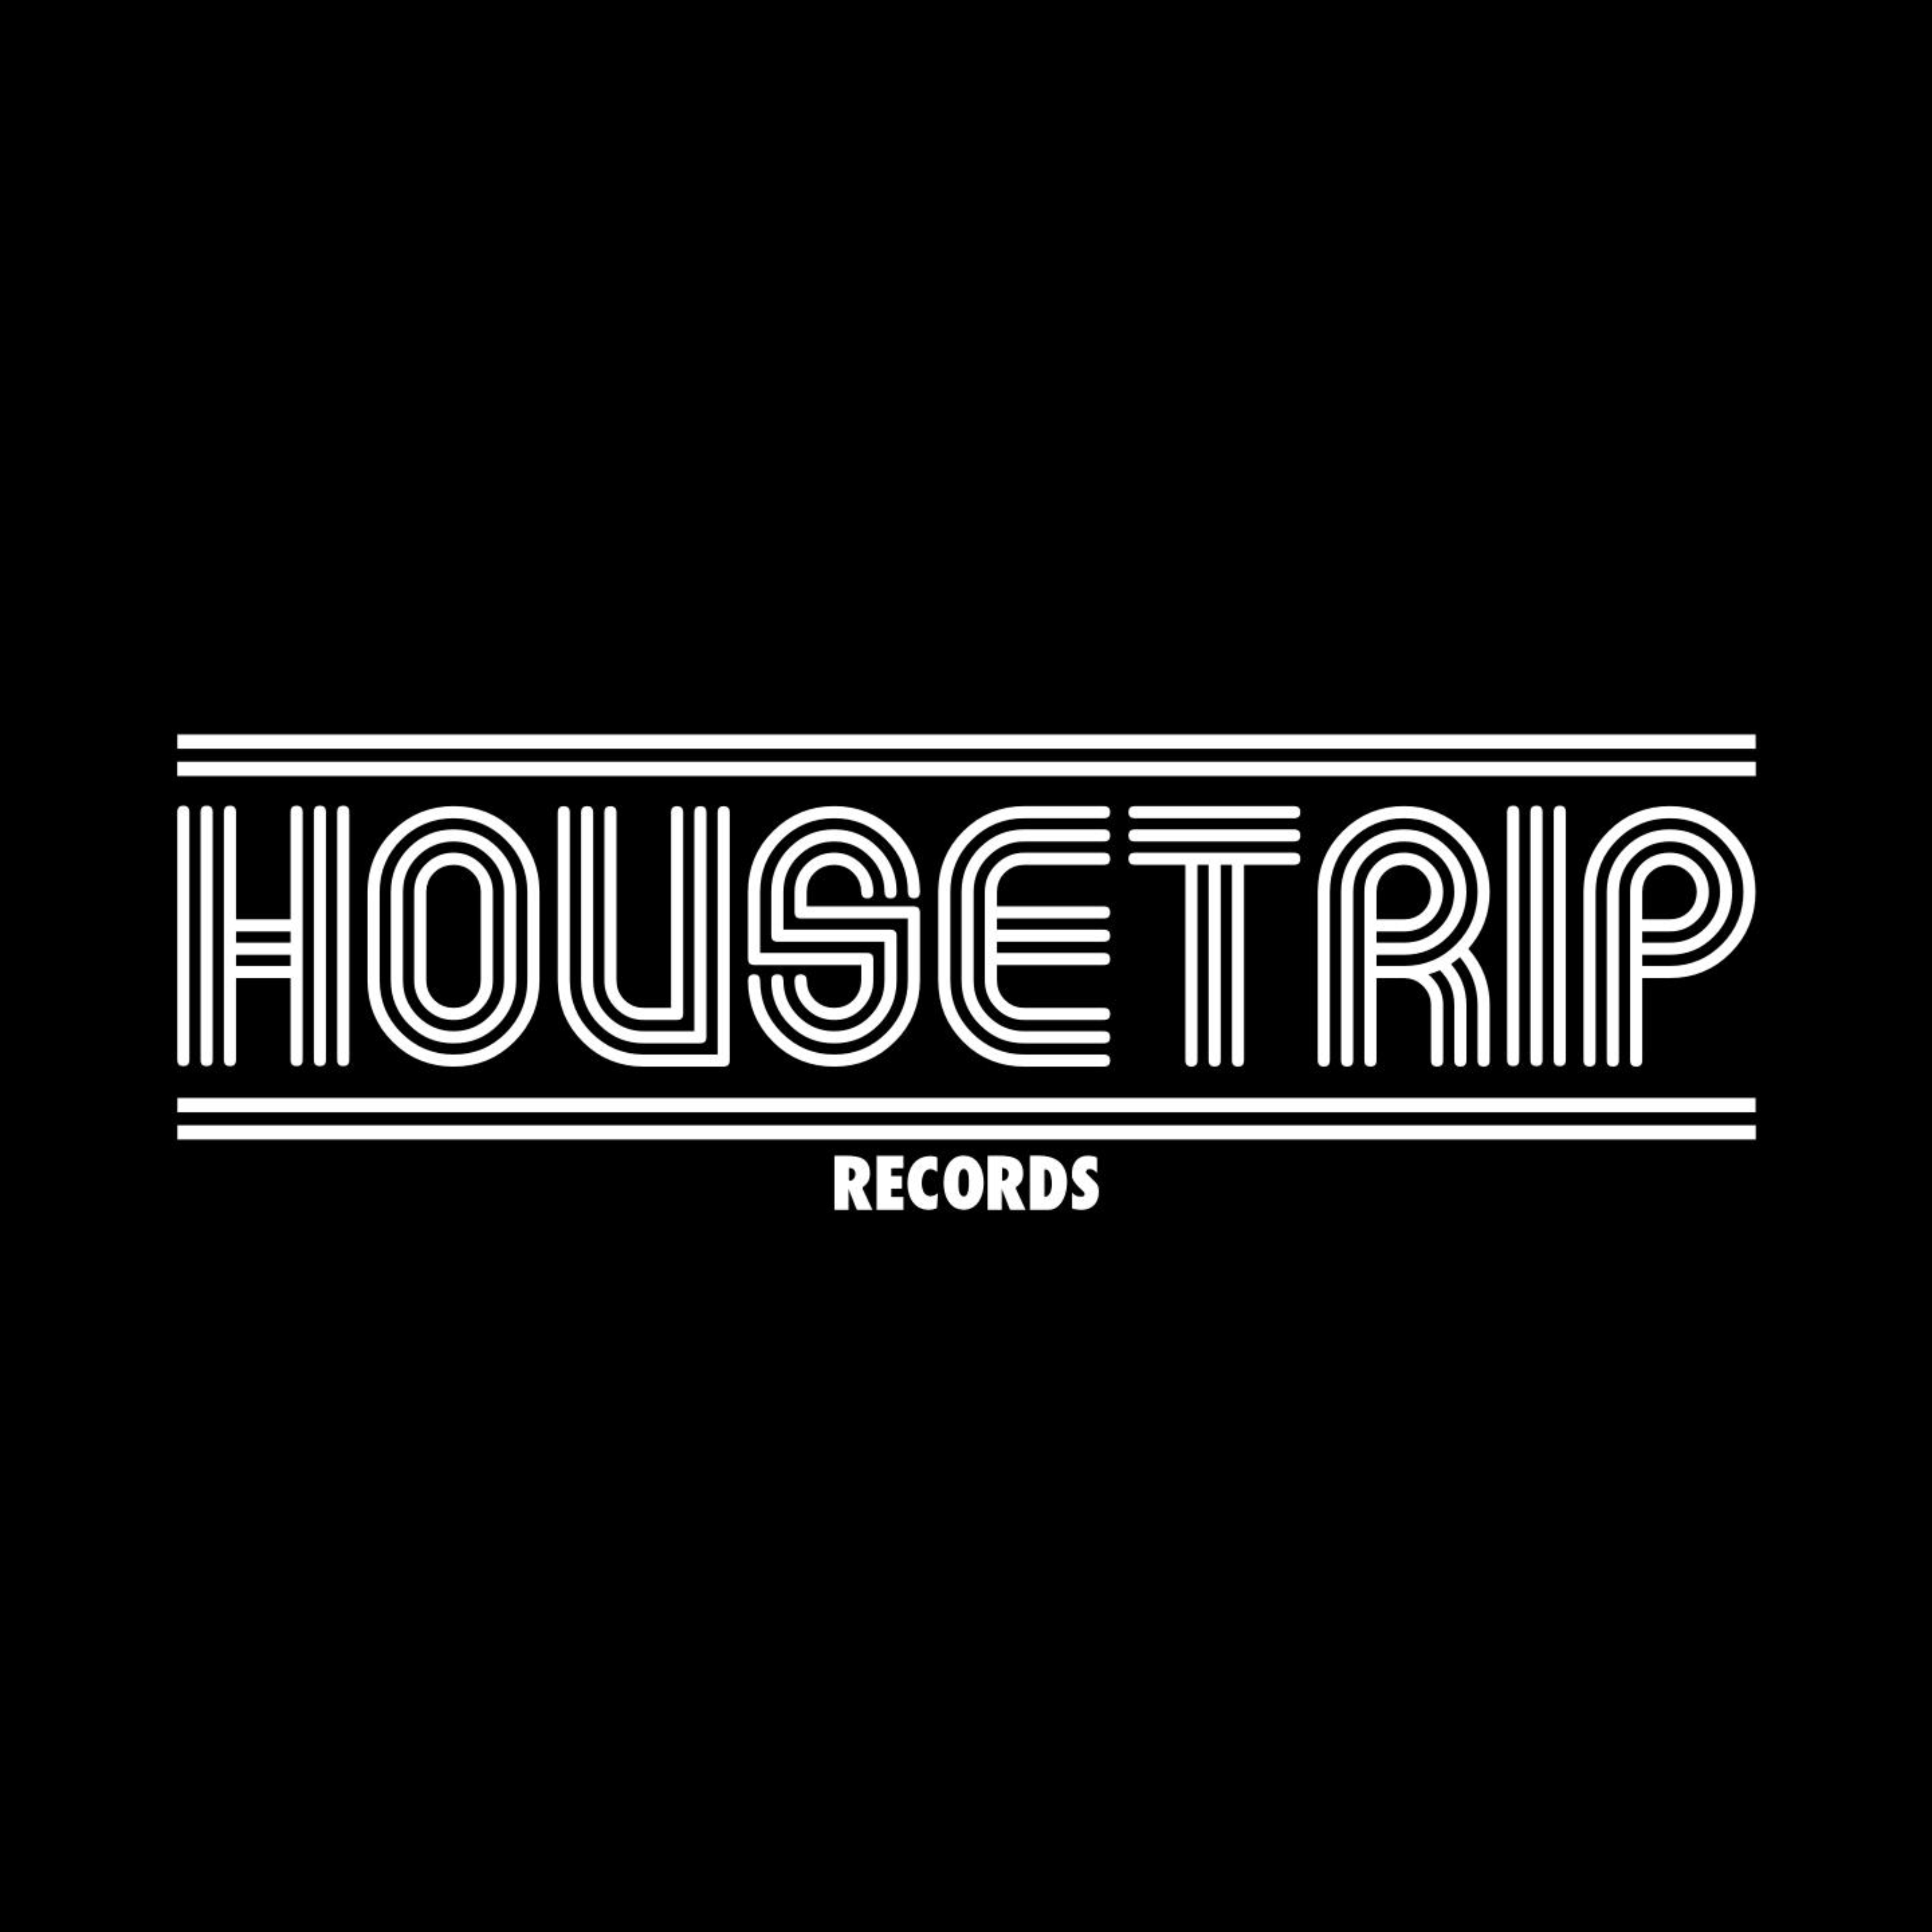 Housetrip Records